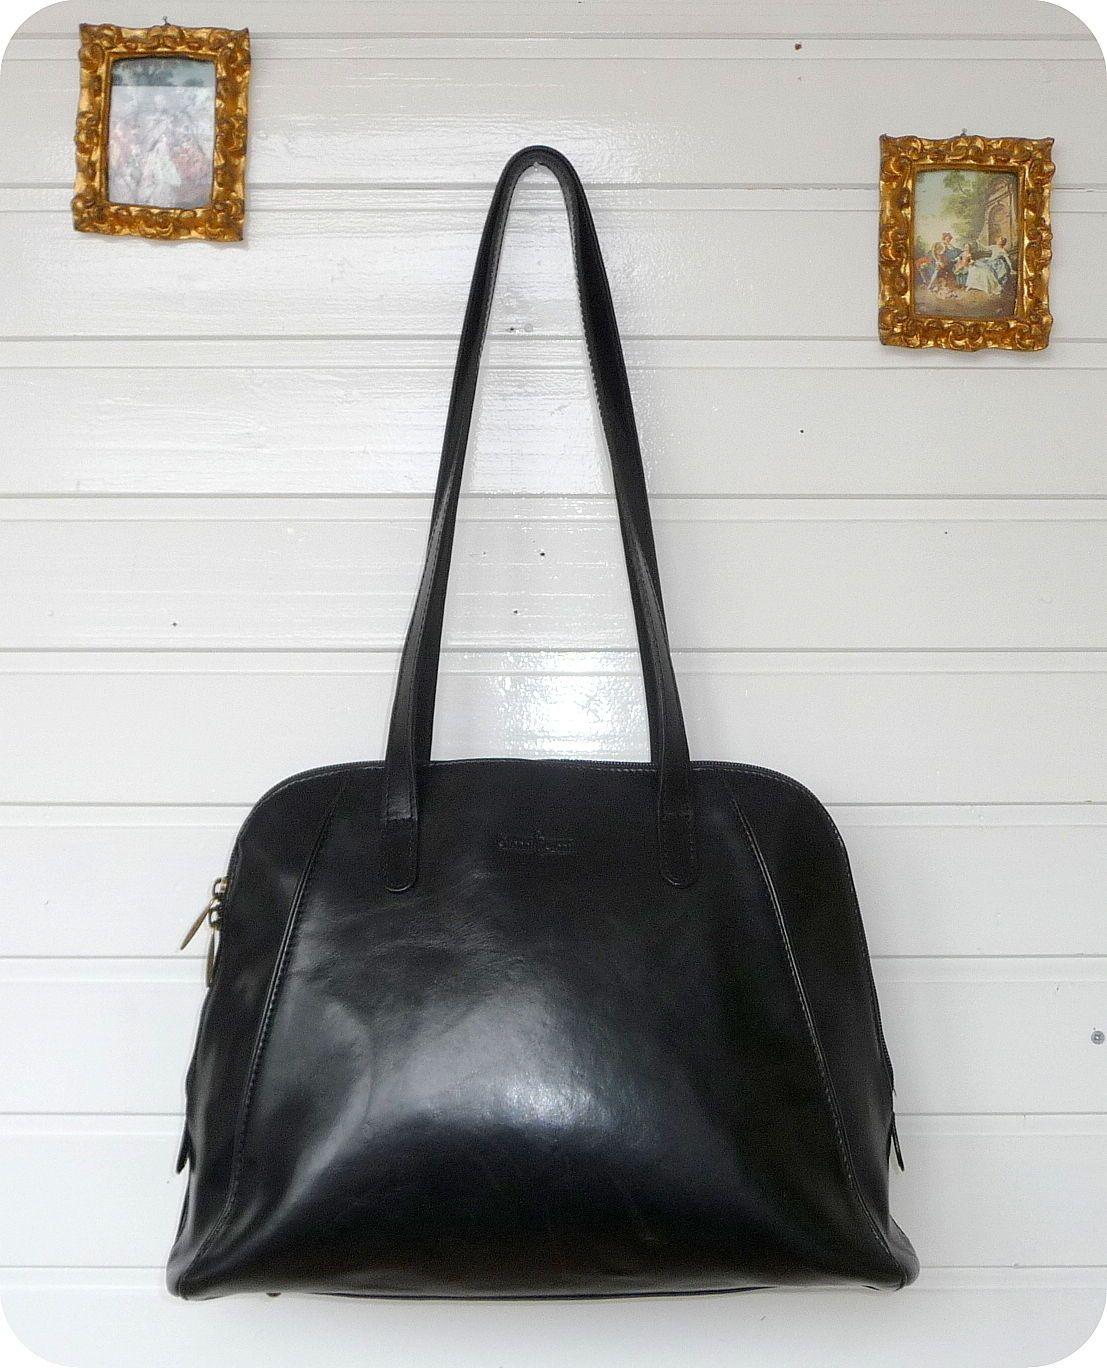 GIANNI CONTI Luxus XL Leder Handtasche Leather Bag